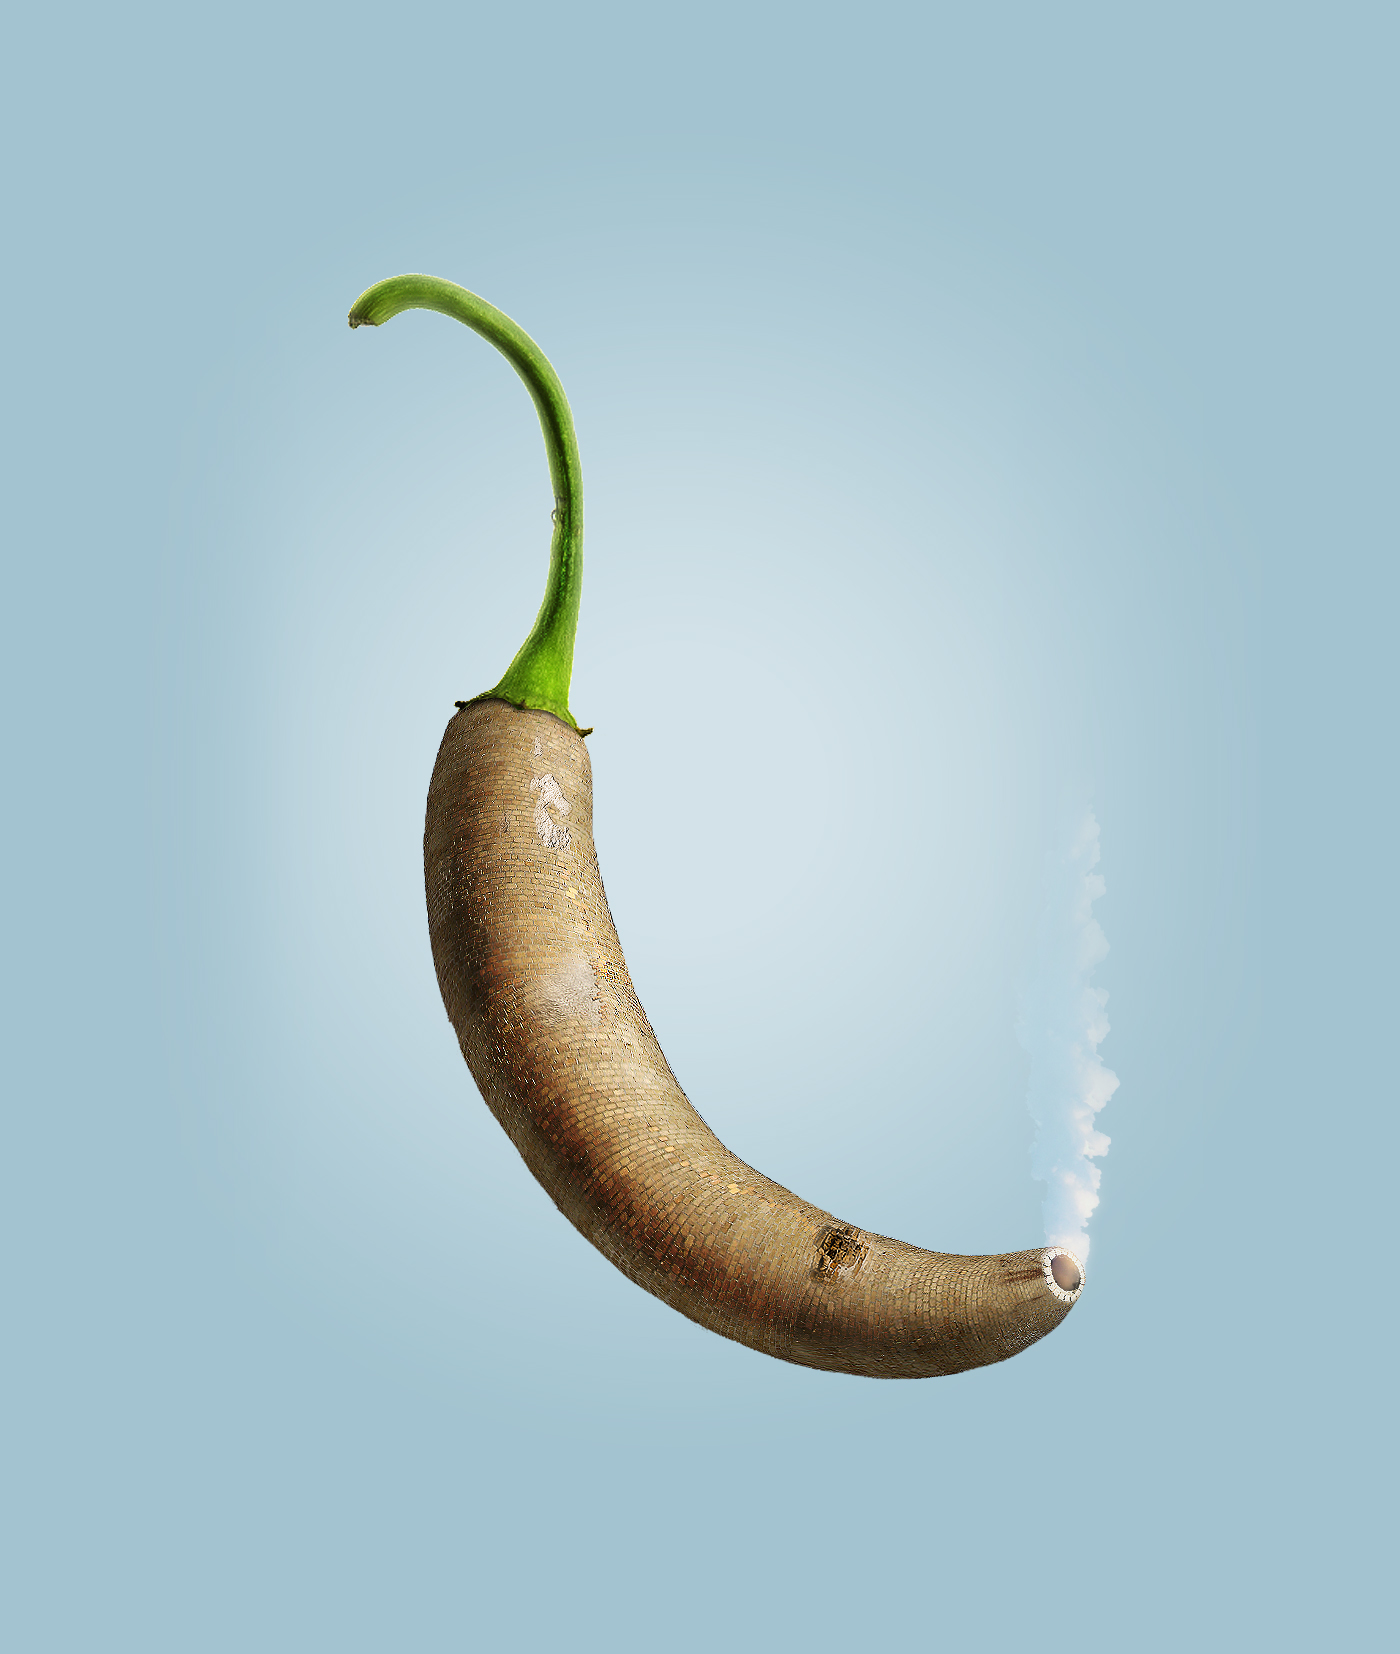 Chili Pepper,digital illustration,photo editing,Photo Retouching,spicy,Kirio,HIBO